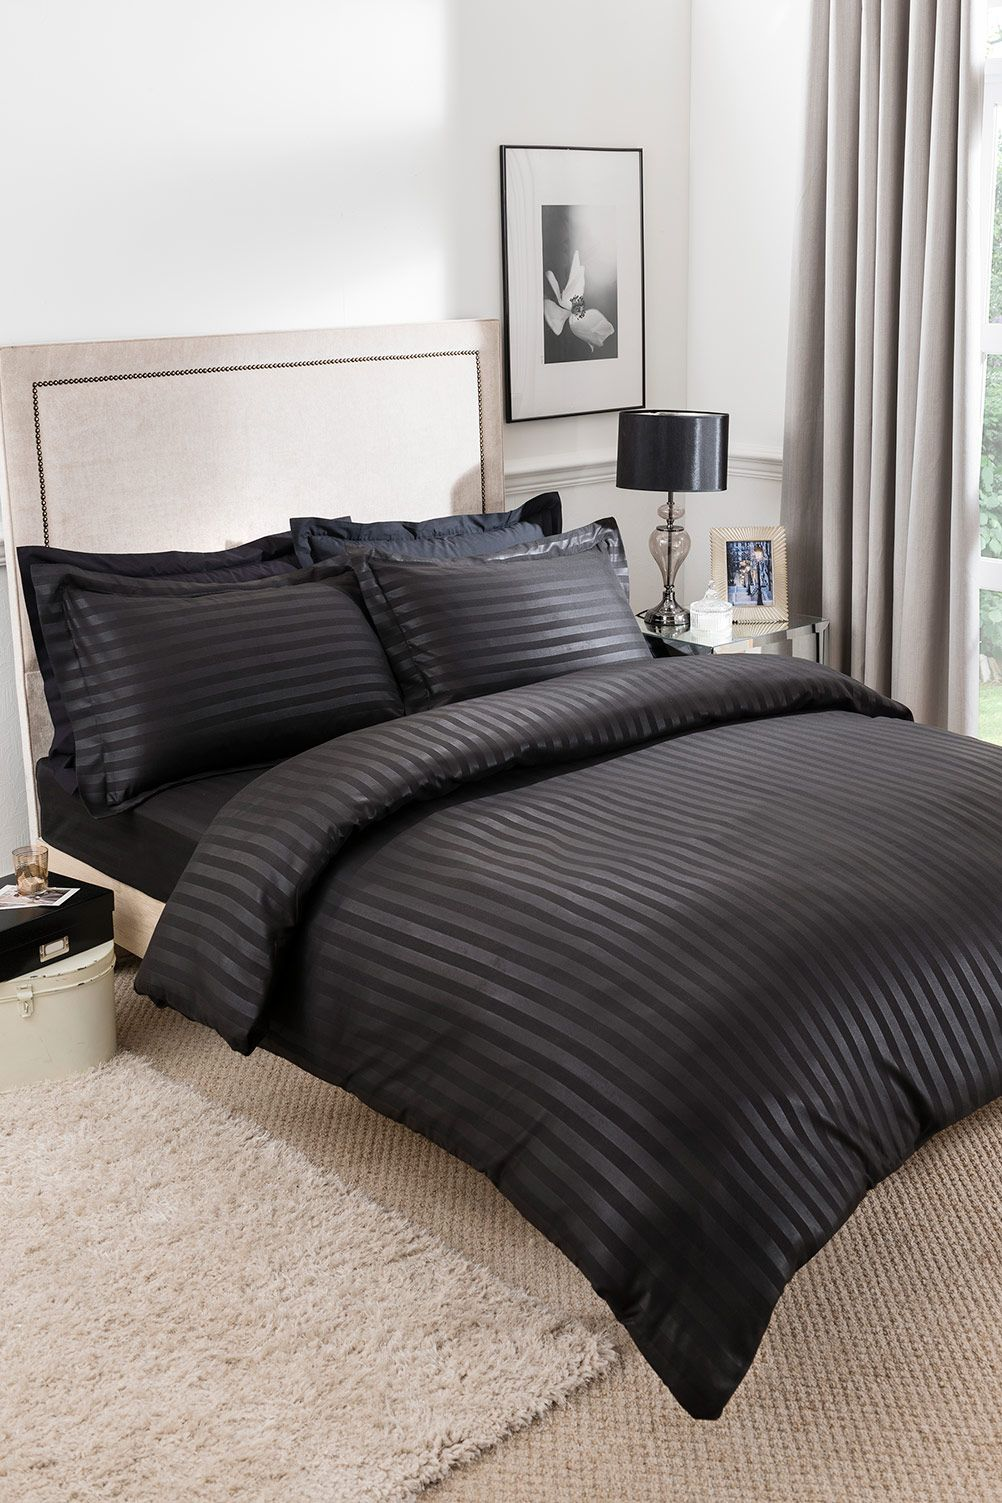 Black Satin Stripe Complete Set King Size Simple yet